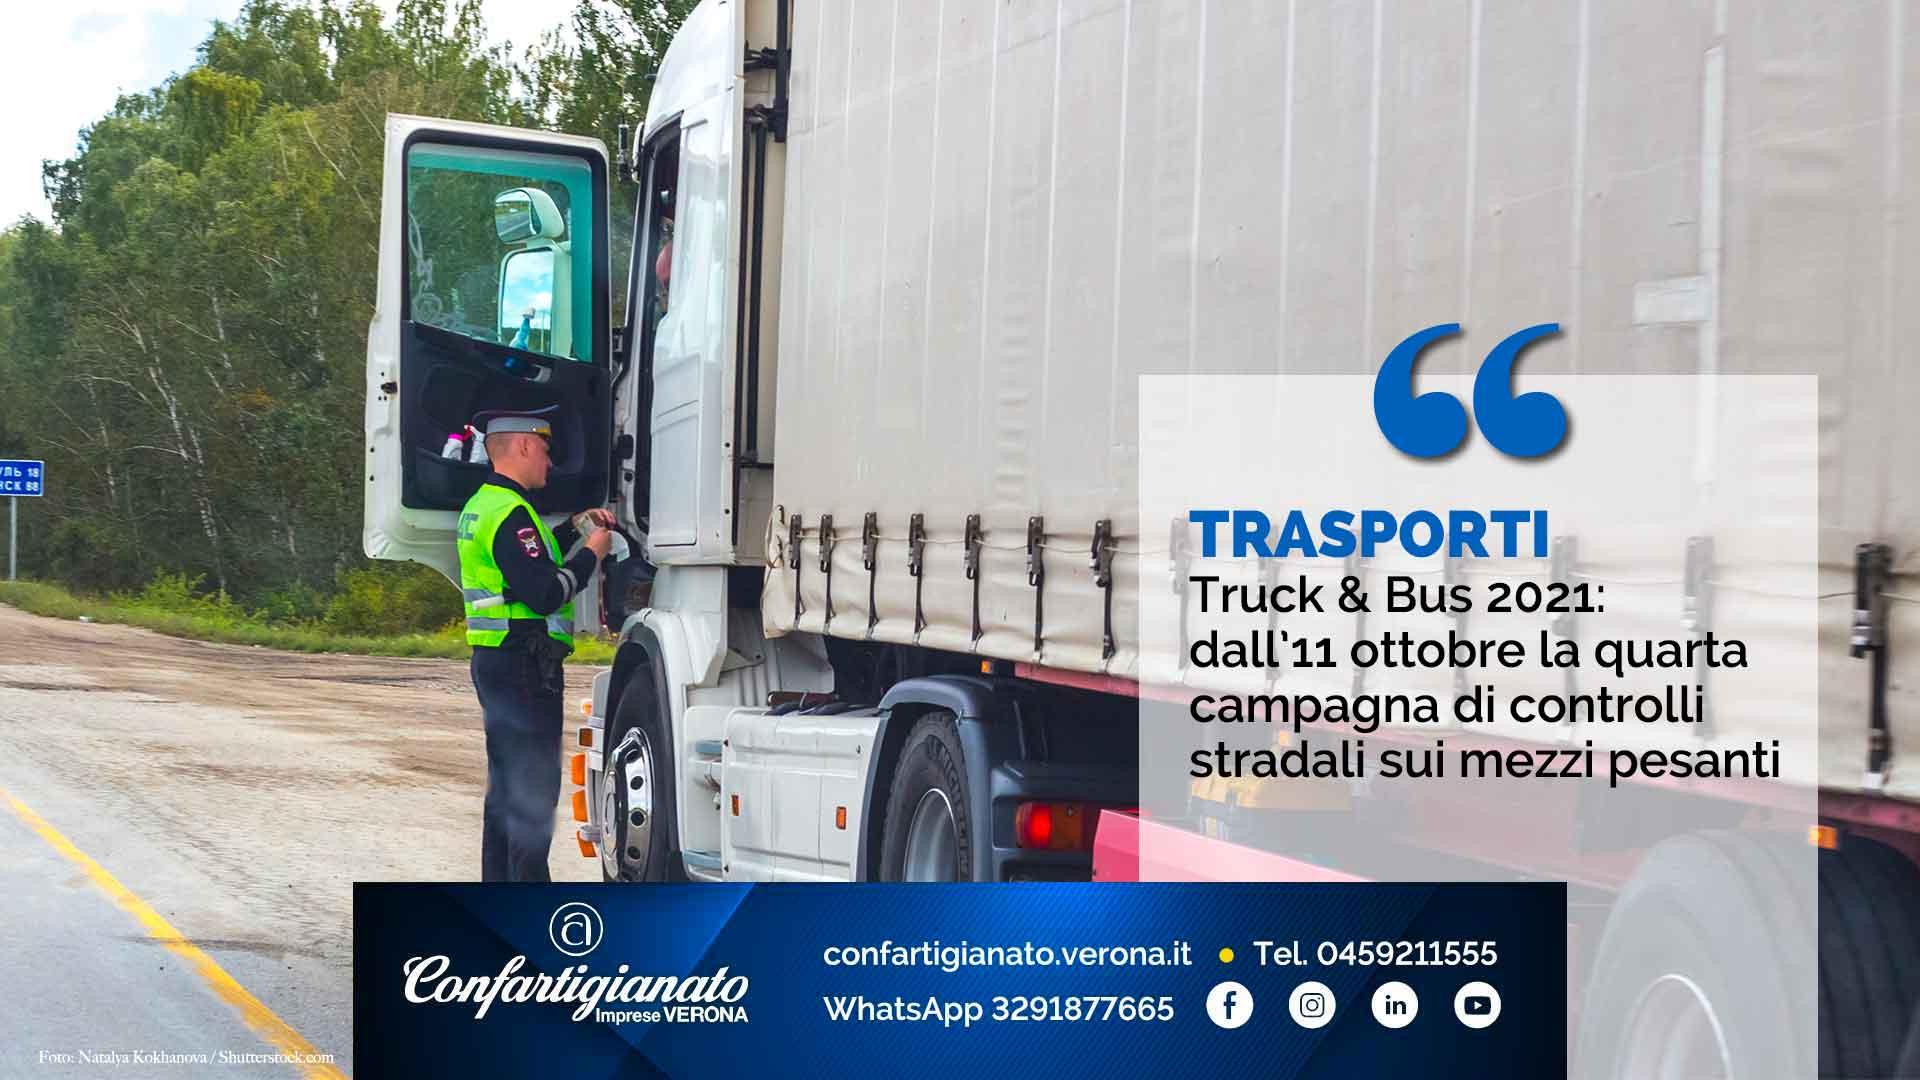 TRASPORTI – Truck & Bus 2021: dall'11 ottobre la quarta campagna di controlli stradali sui mezzi pesanti